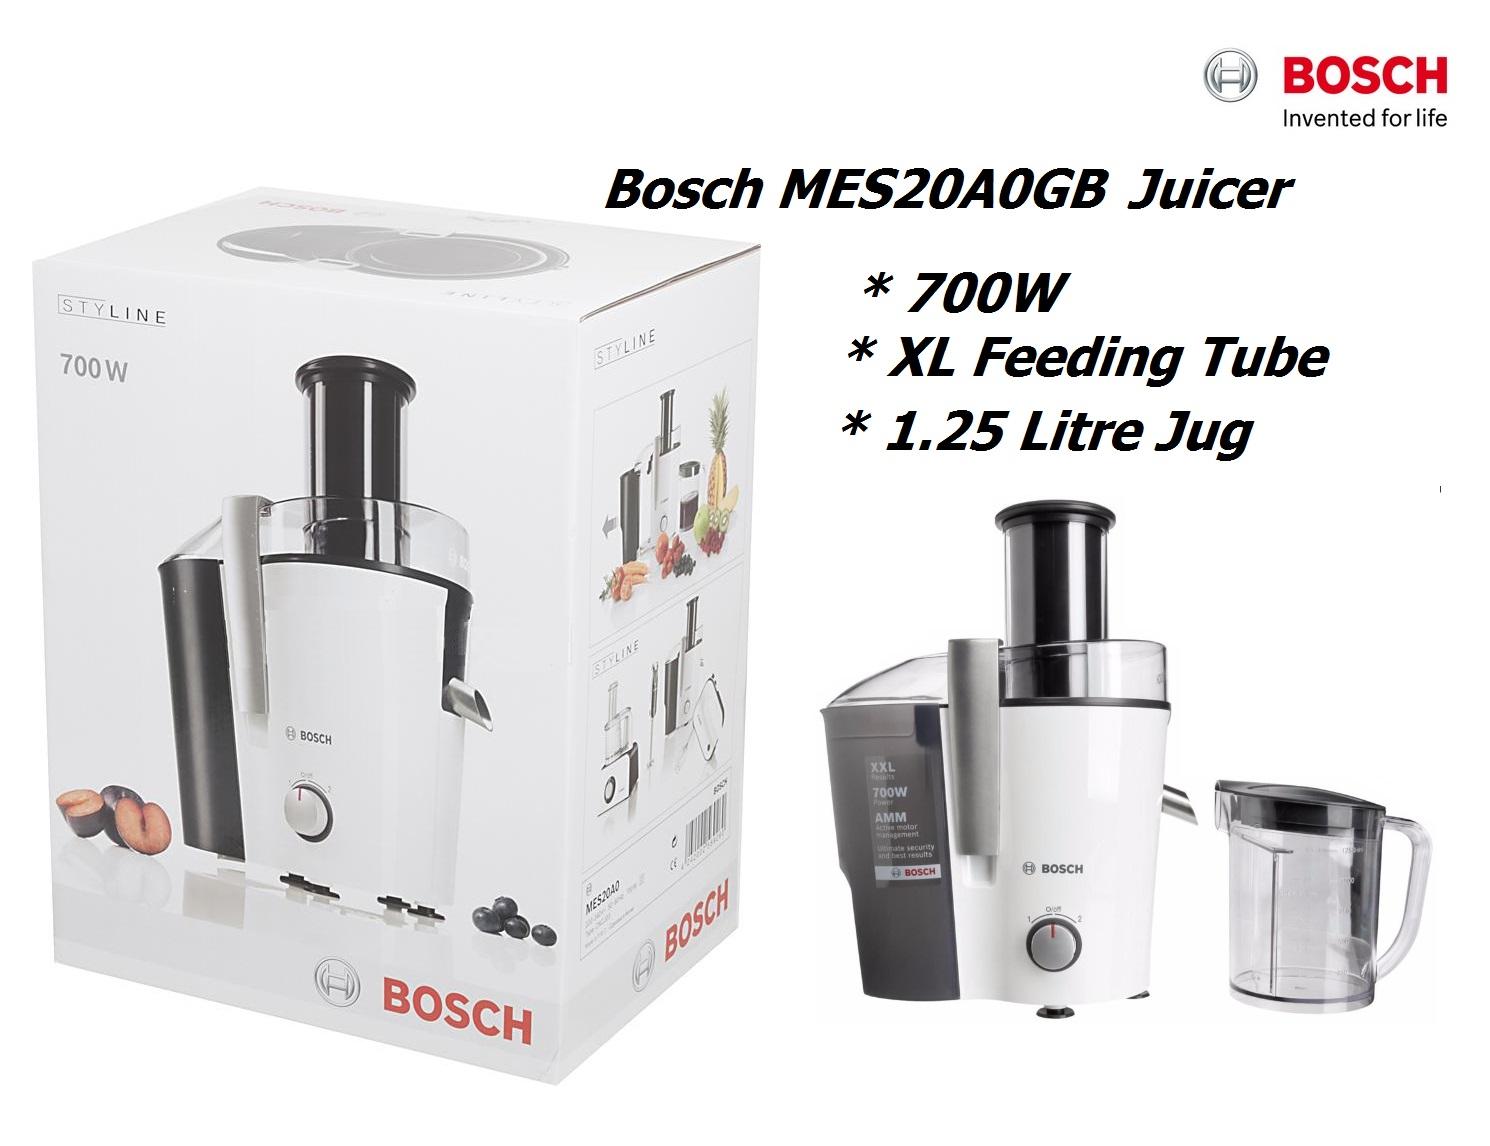 Bosch MES3000GB Juicer, 700 W 1.25 L